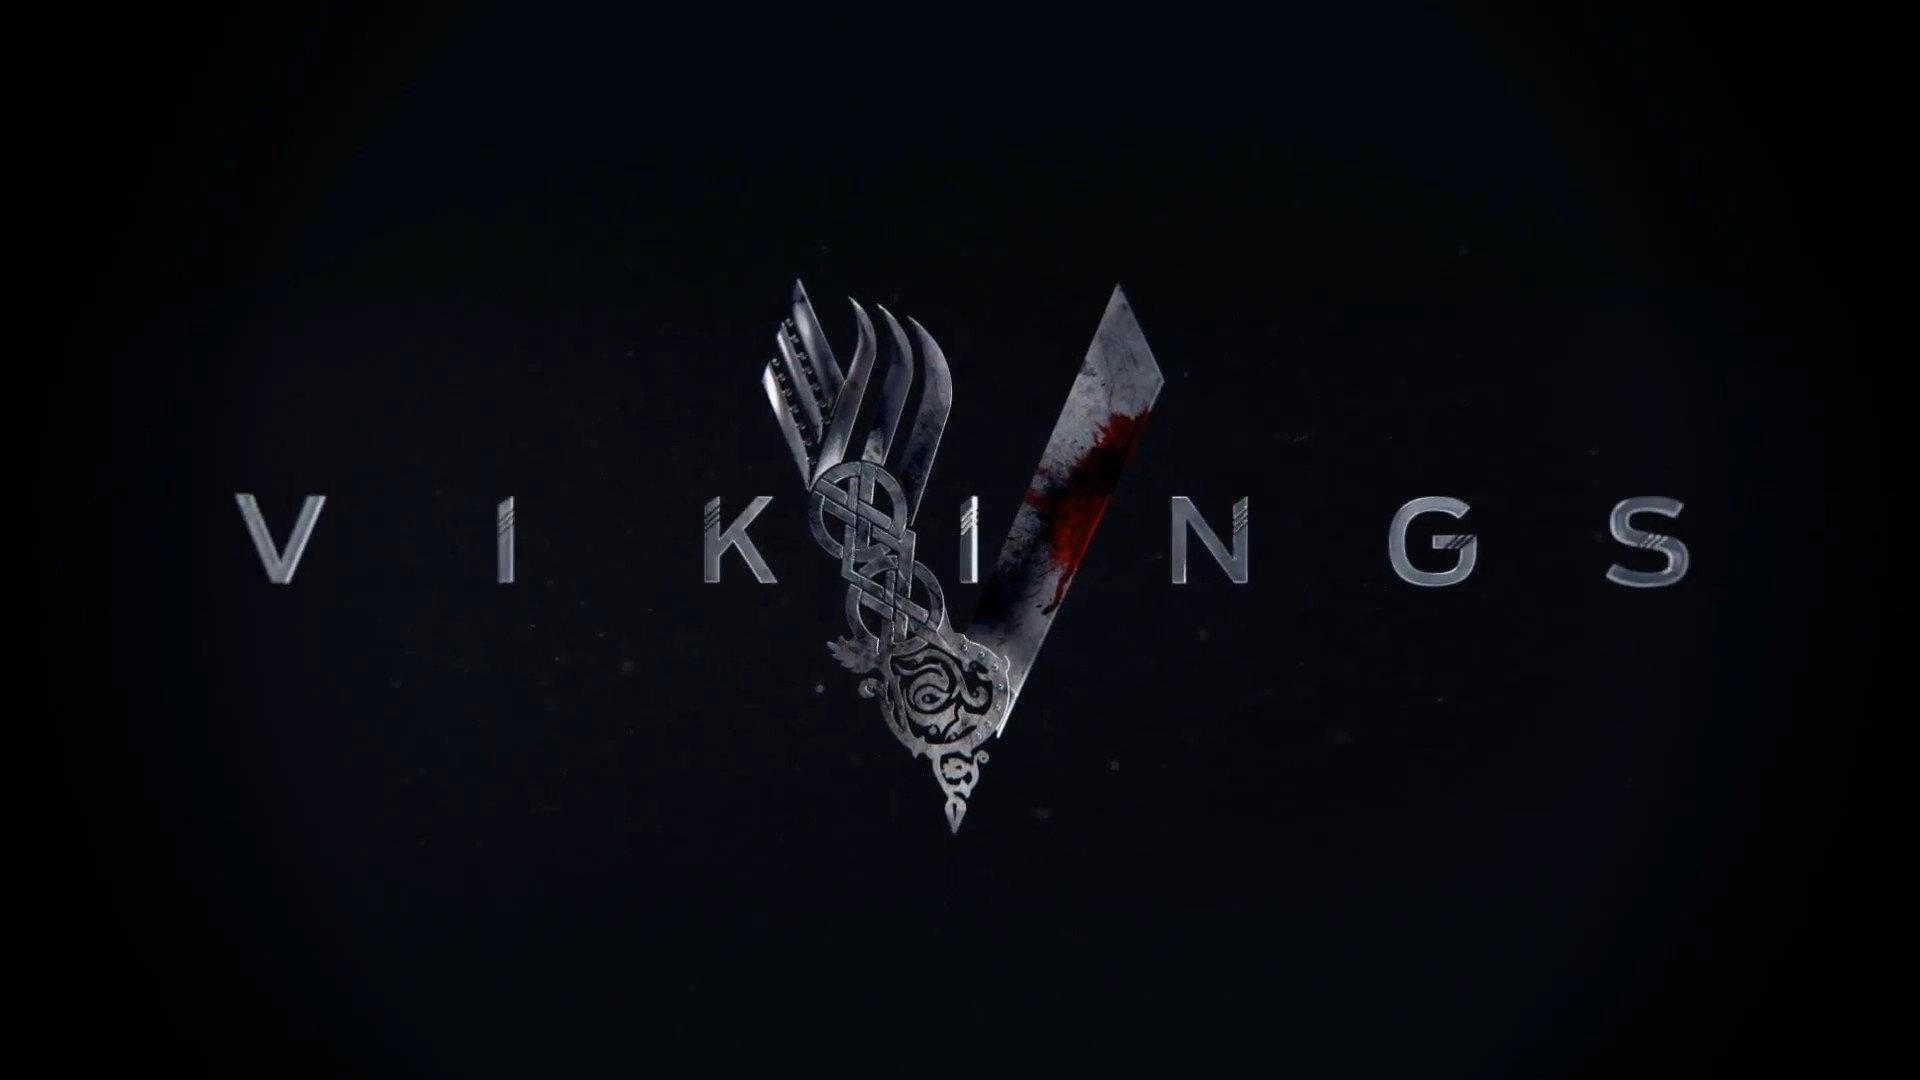 Vikings wallpapers 1920x1080 Full HD (1080p) desktop backgrounds